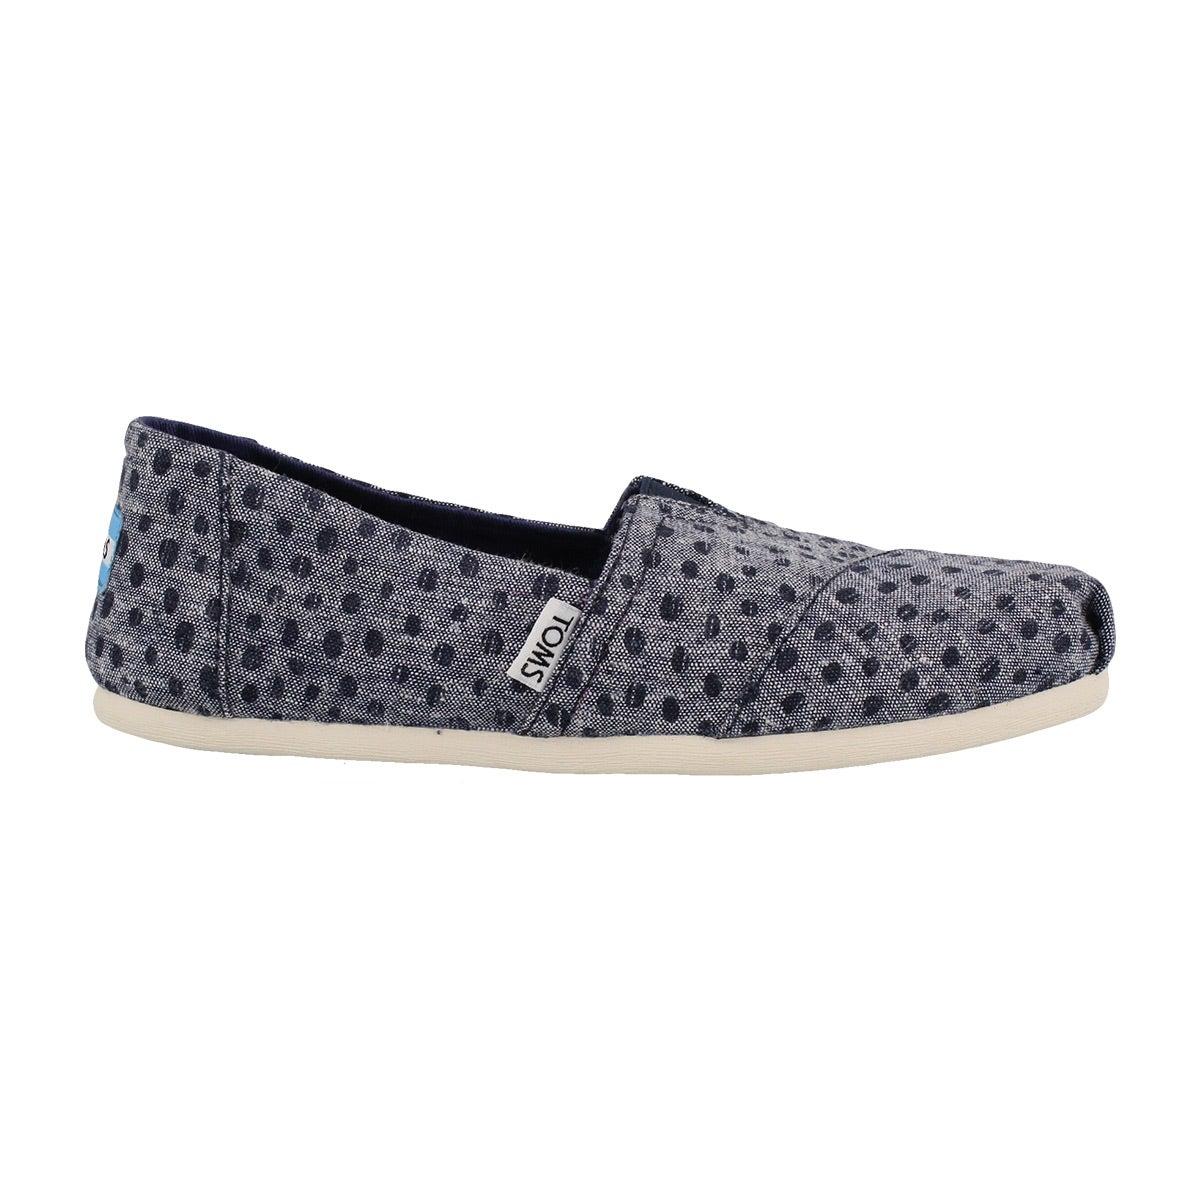 a8f60e9d5b4f Toms | Casual Shoes | SoftMoc.com